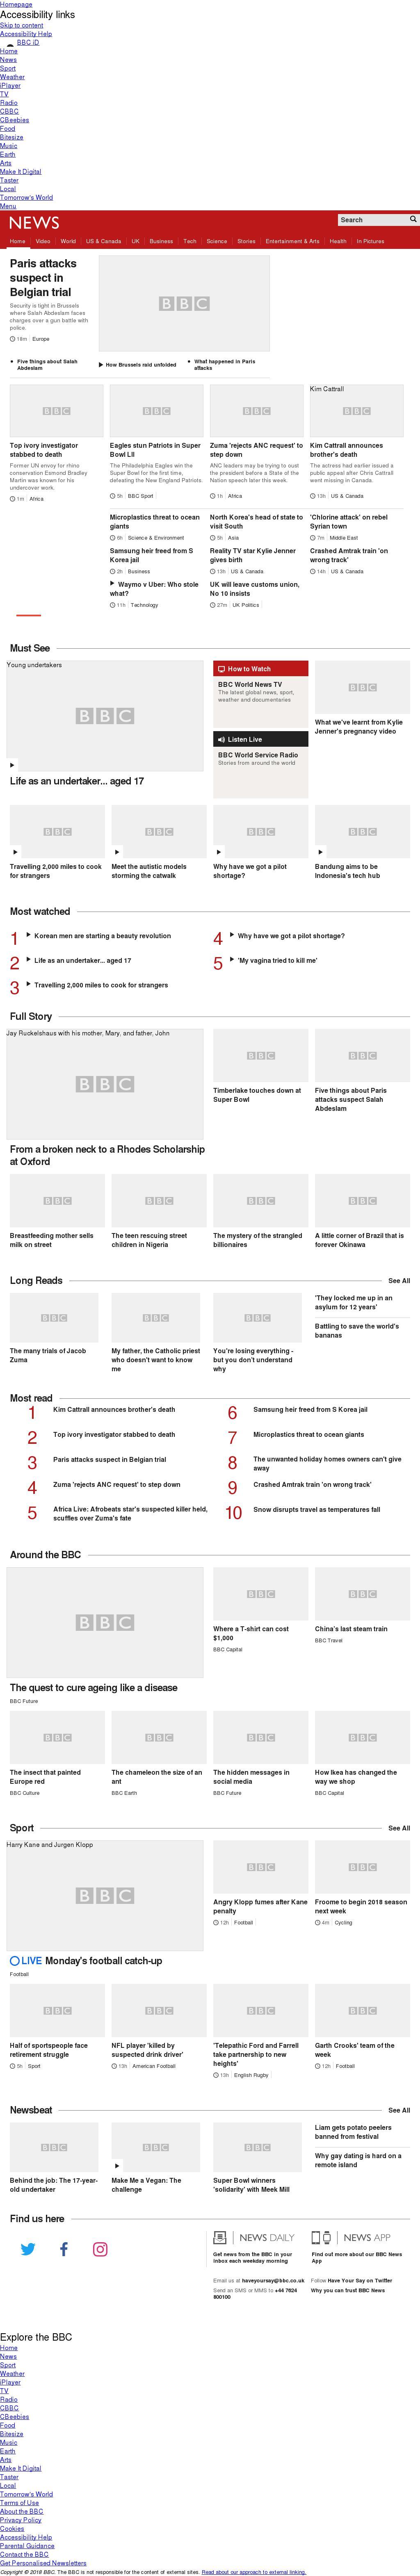 BBC at Monday Feb. 5, 2018, 11 a.m. UTC